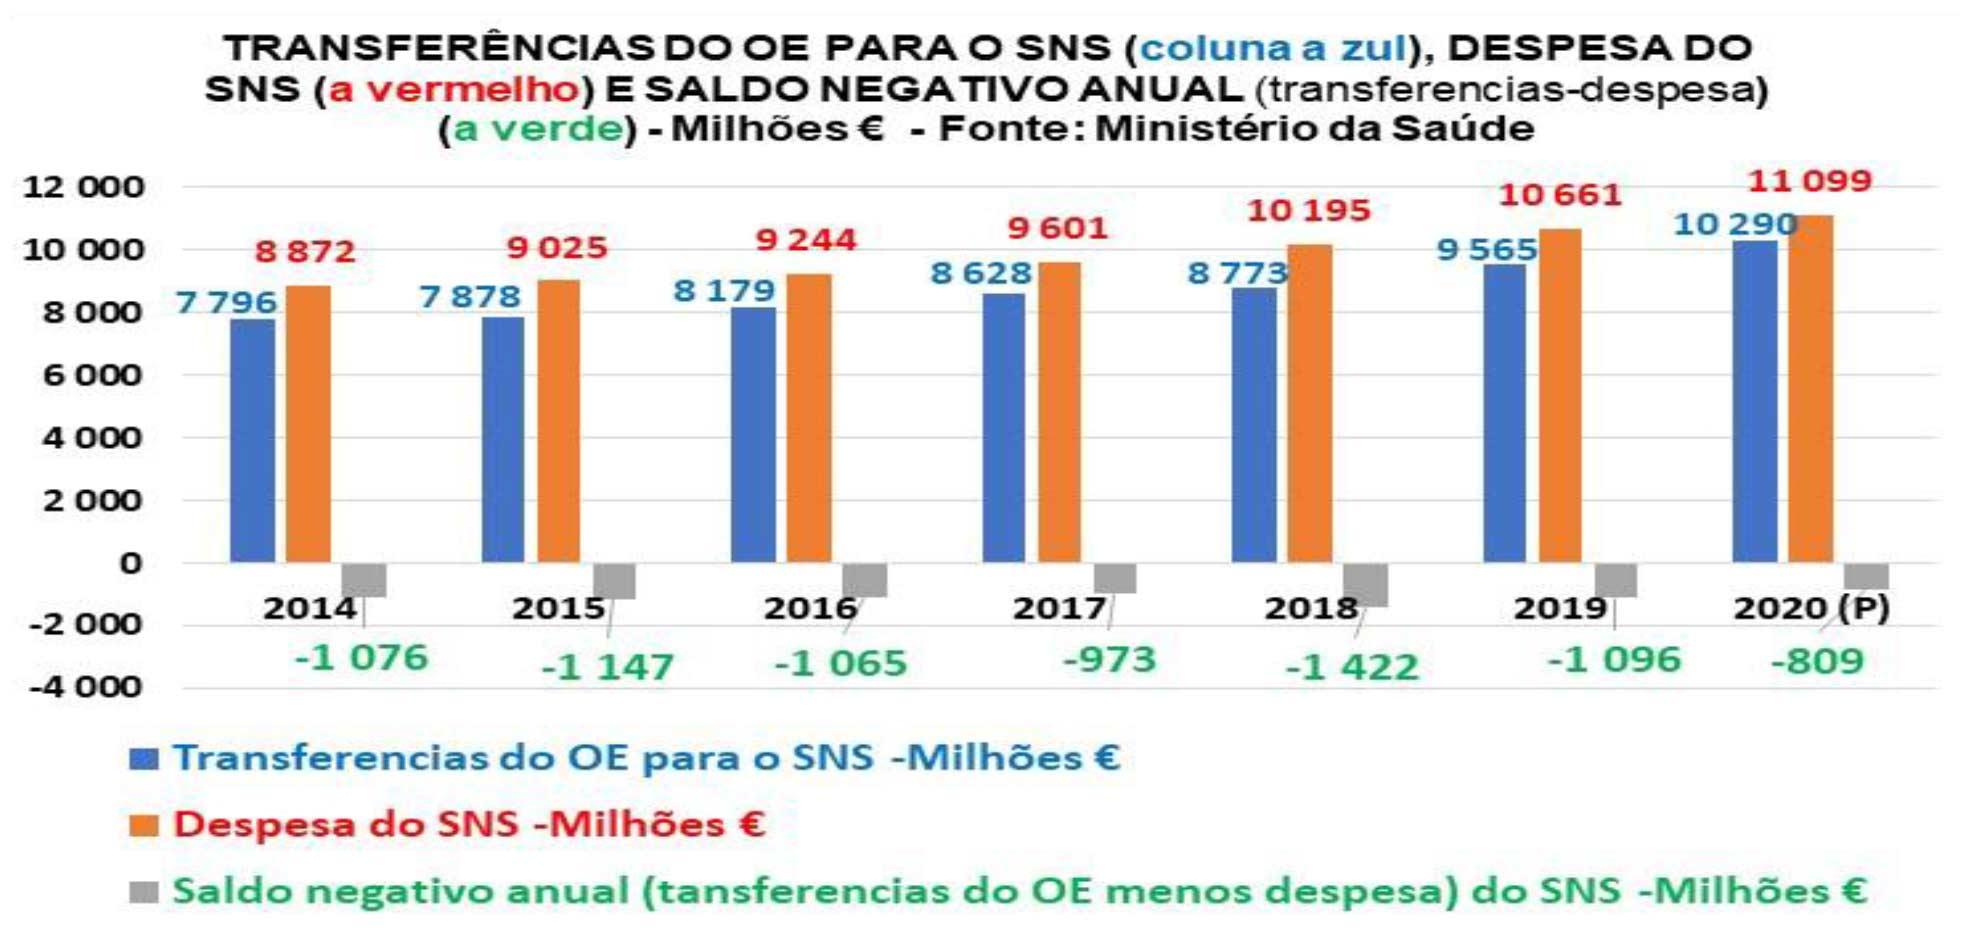 Subfinanciamento crónico do SNS continua